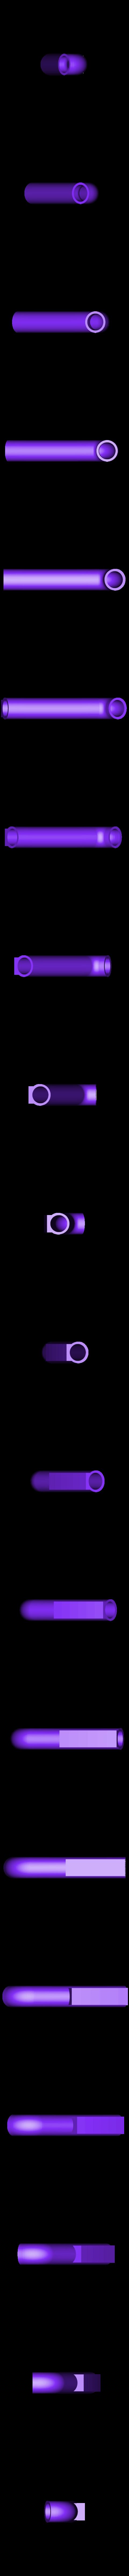 exhaust left.stl Download free STL file 1991 Mazda 787B 3d Printed RC Car • 3D printable template, brett